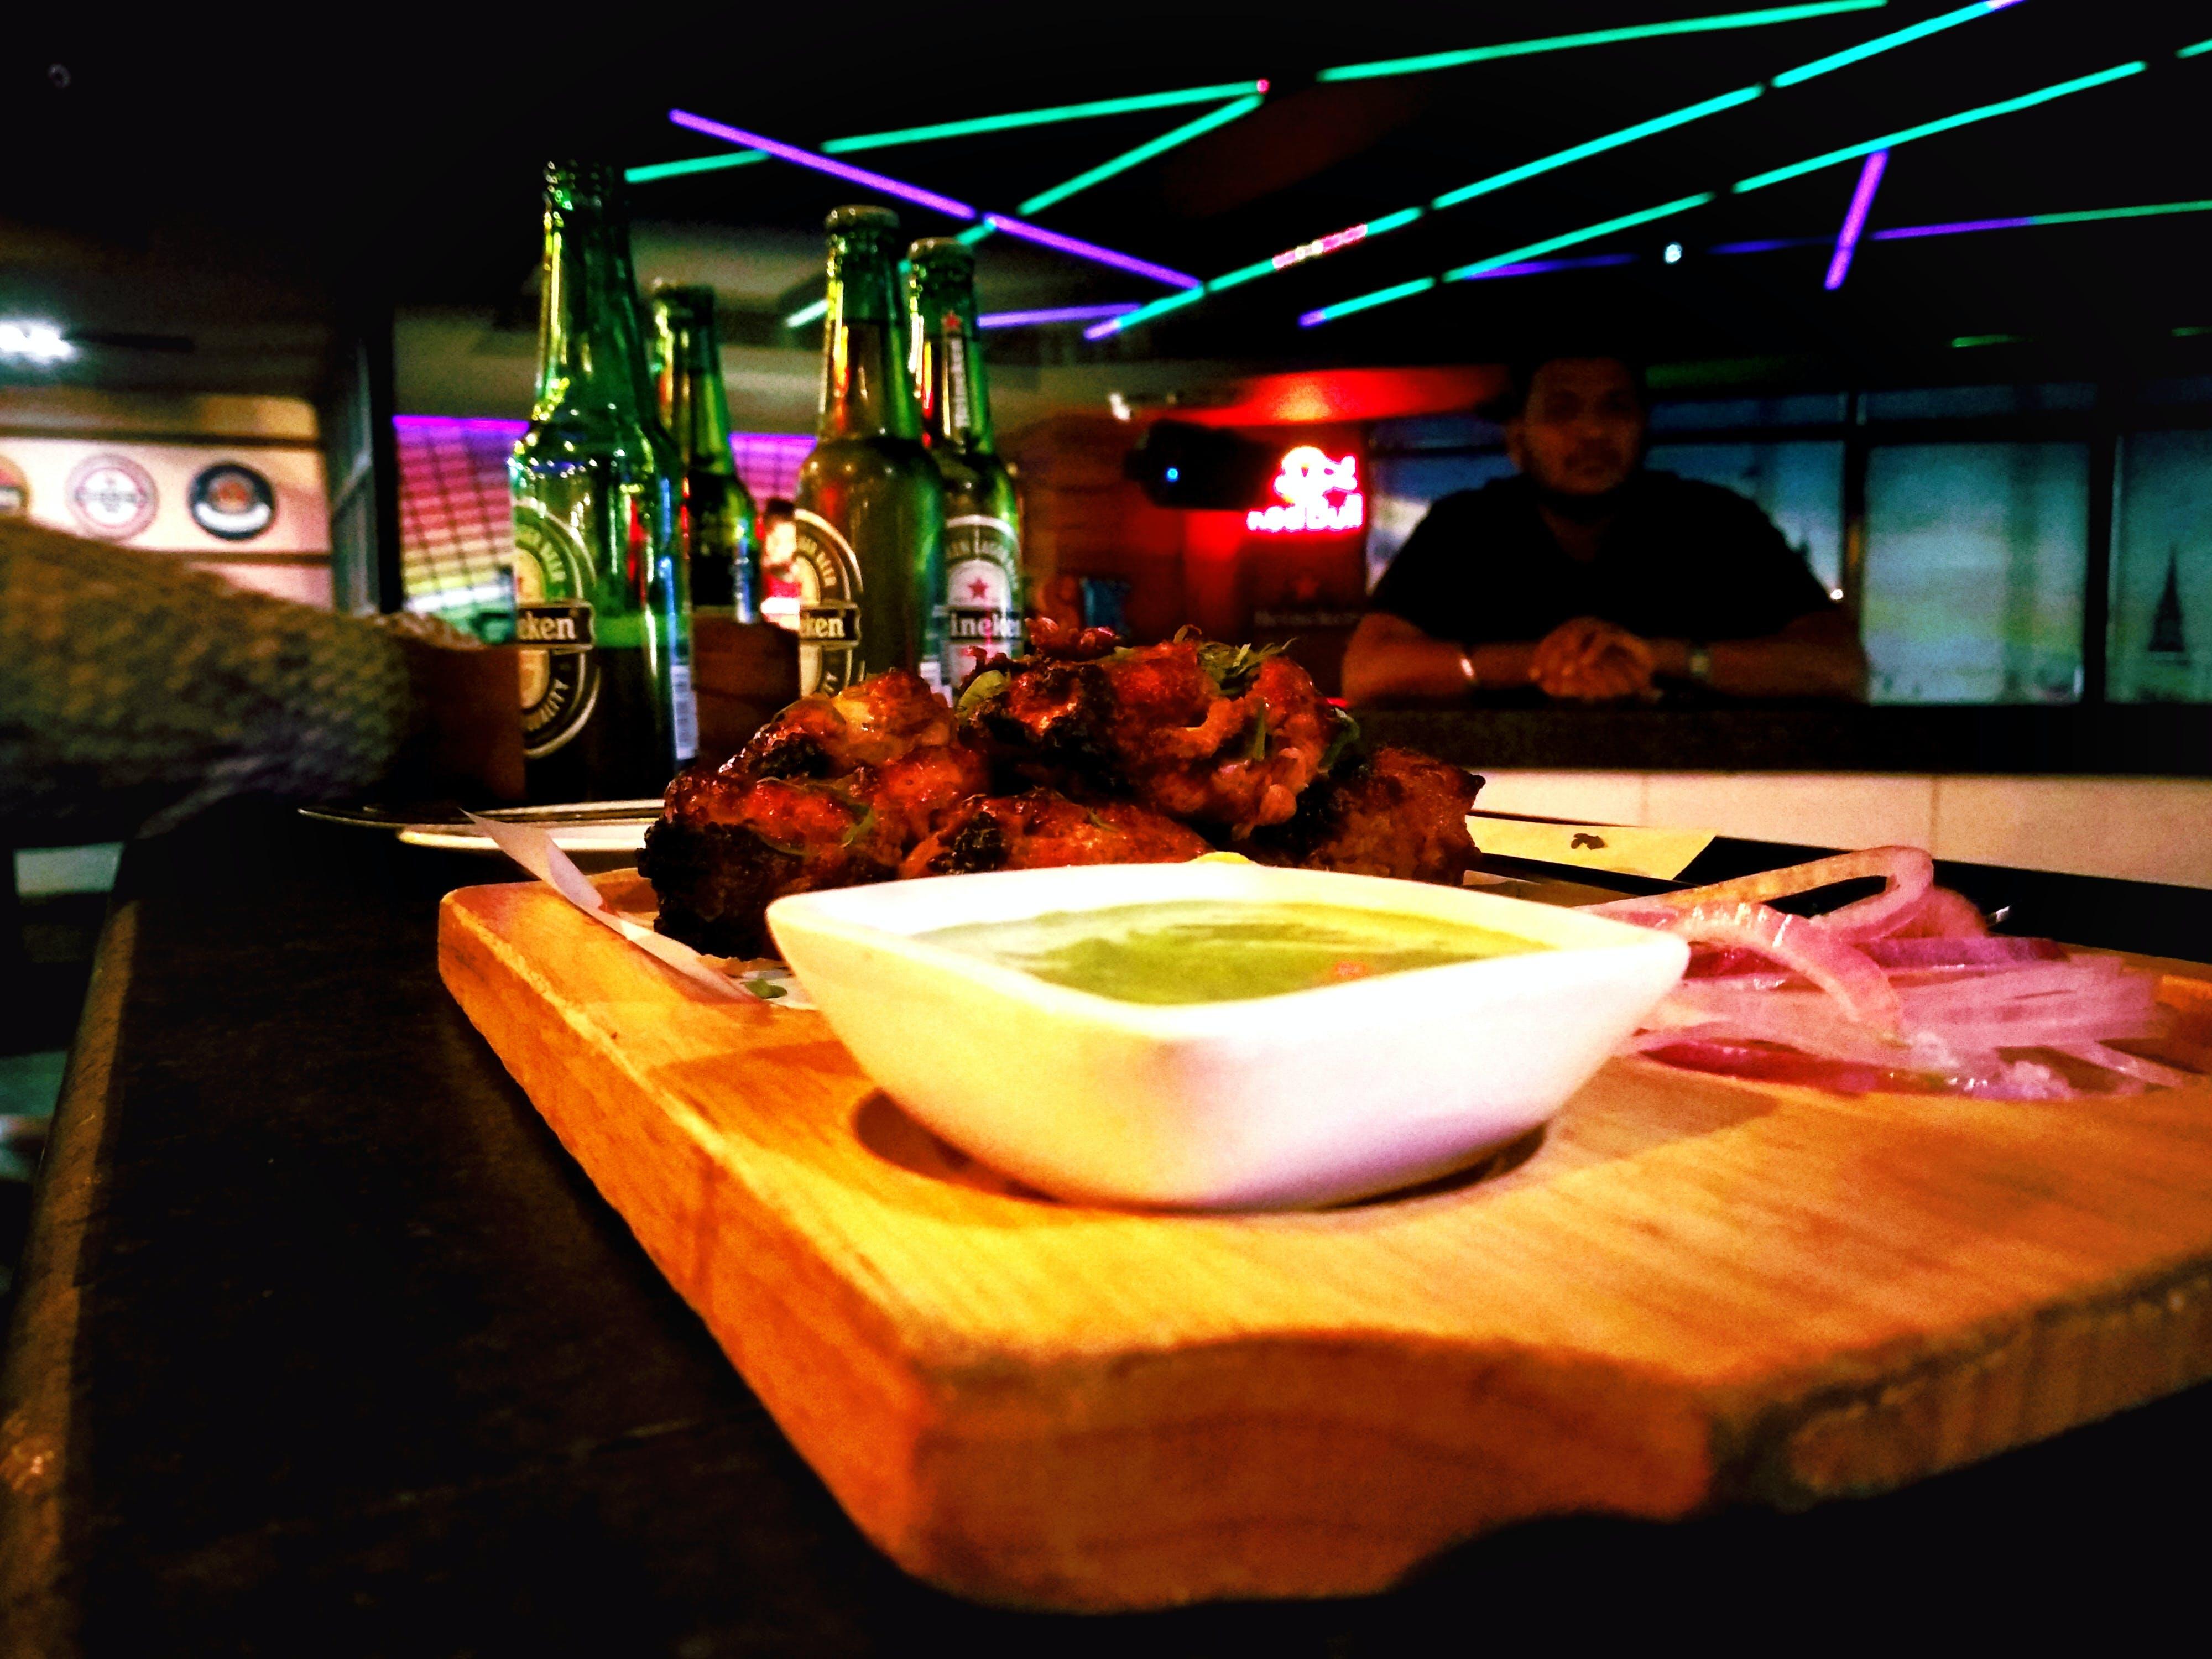 Free stock photo of backlight, bar, beer bottles, chicken